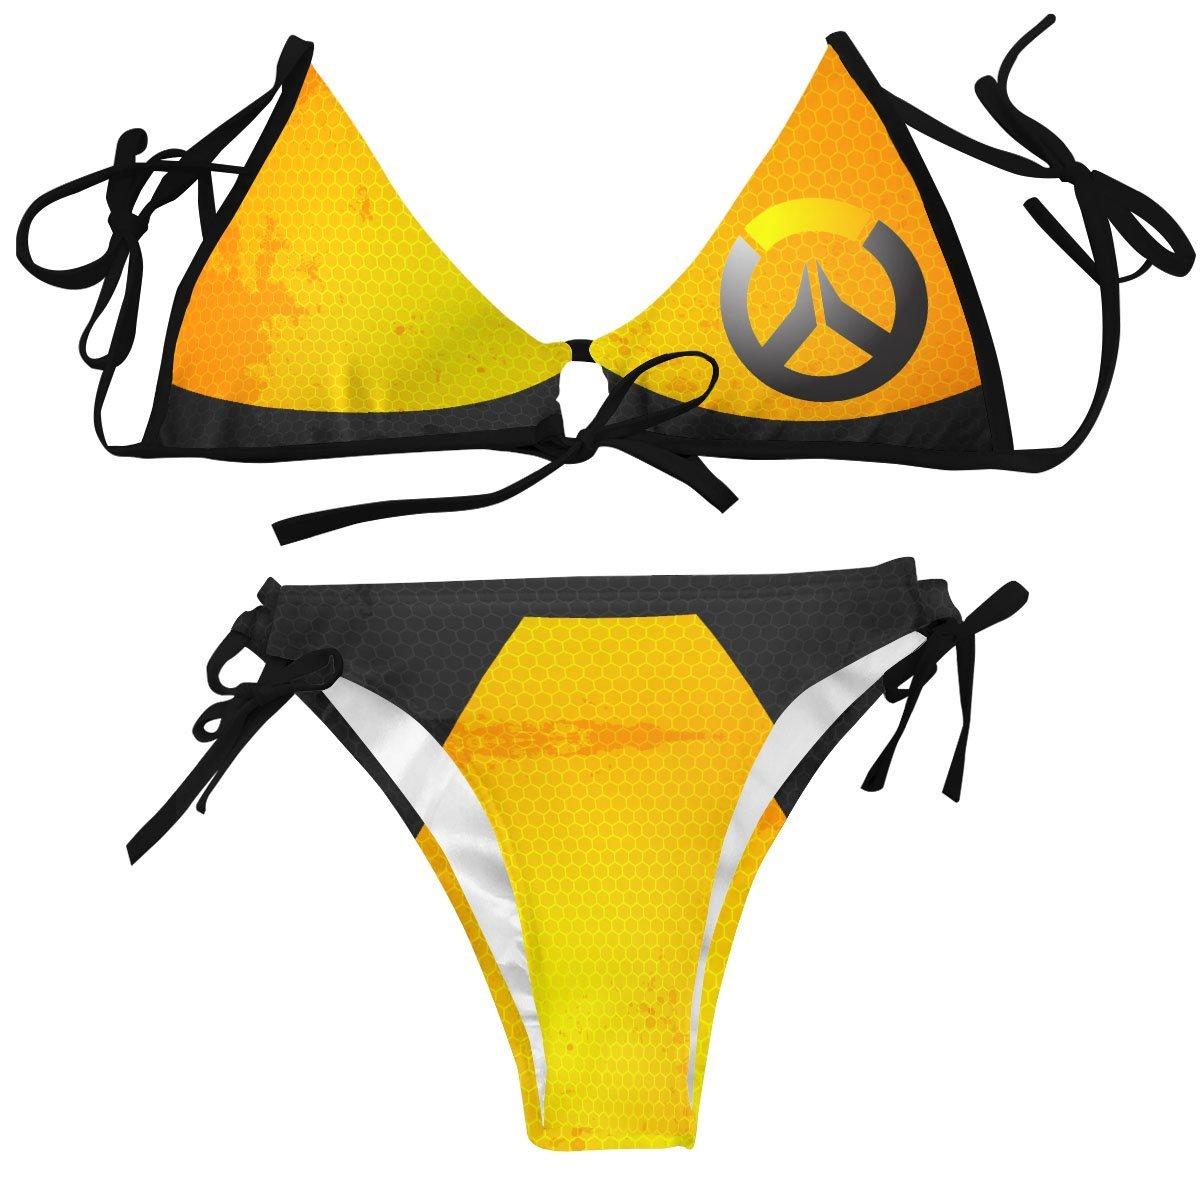 Tracer Summer Bikini Swimsuit FDM3107 XXS Official Anime Swimsuit Merch